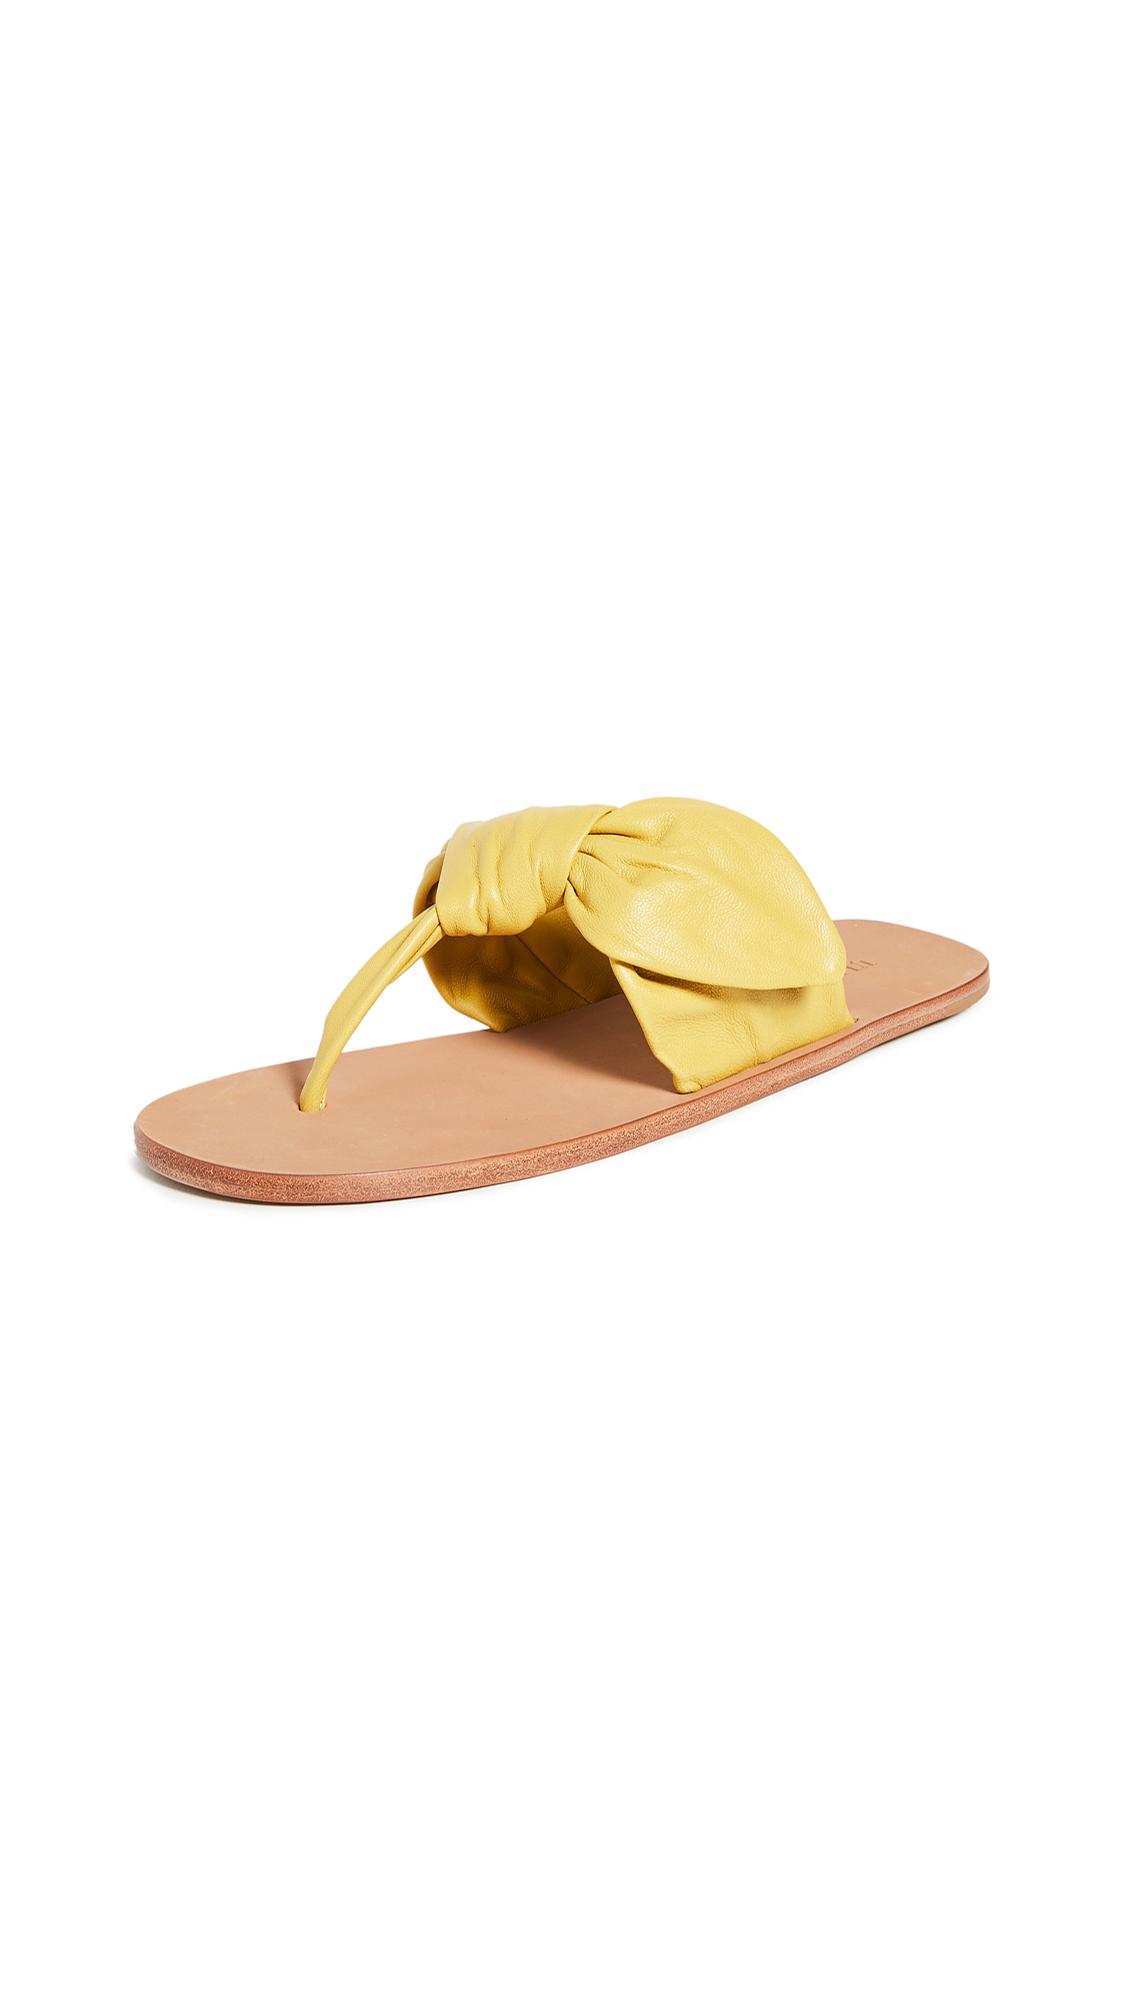 Buy Ulla Johnson Dixie Sandals online, shop Ulla Johnson